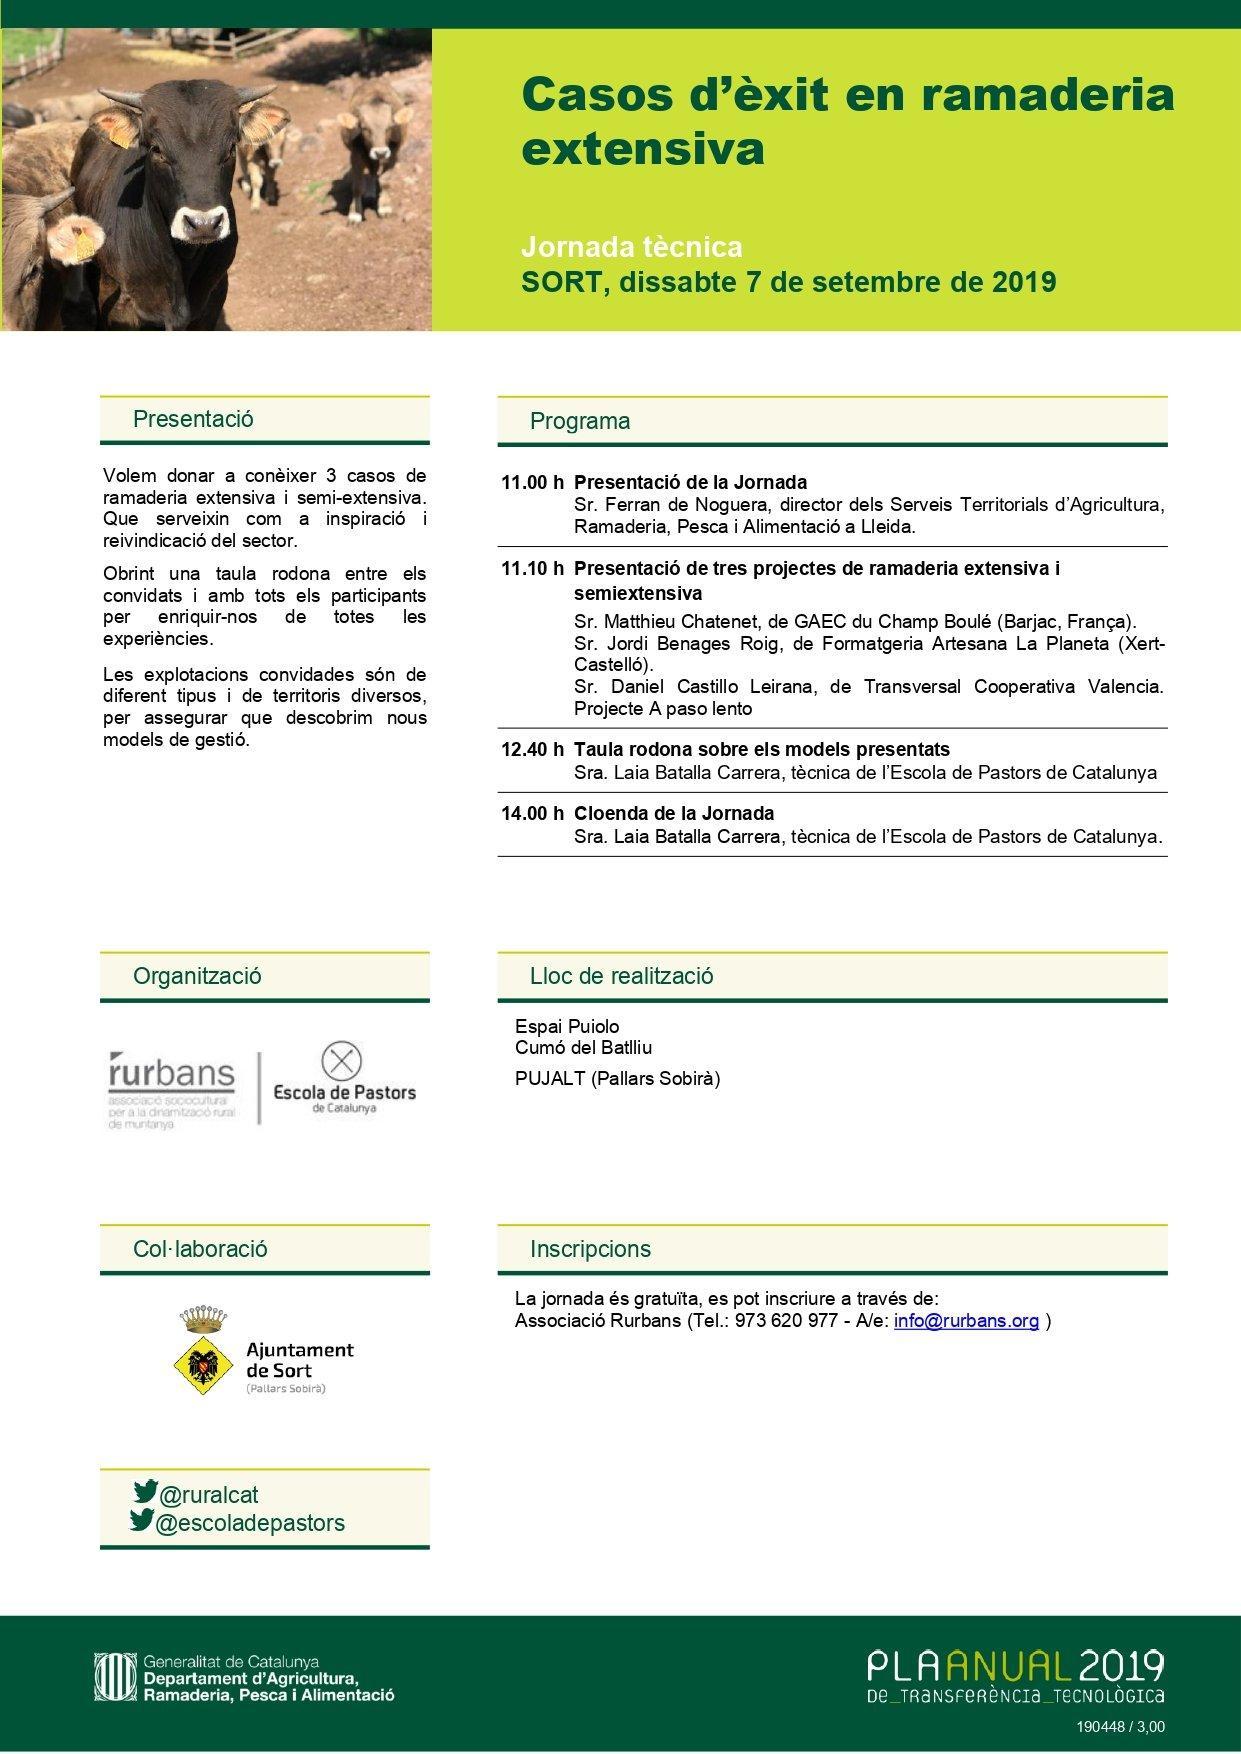 Cartell Jornada tècnica Casos d'èxit ramaderia intensiva